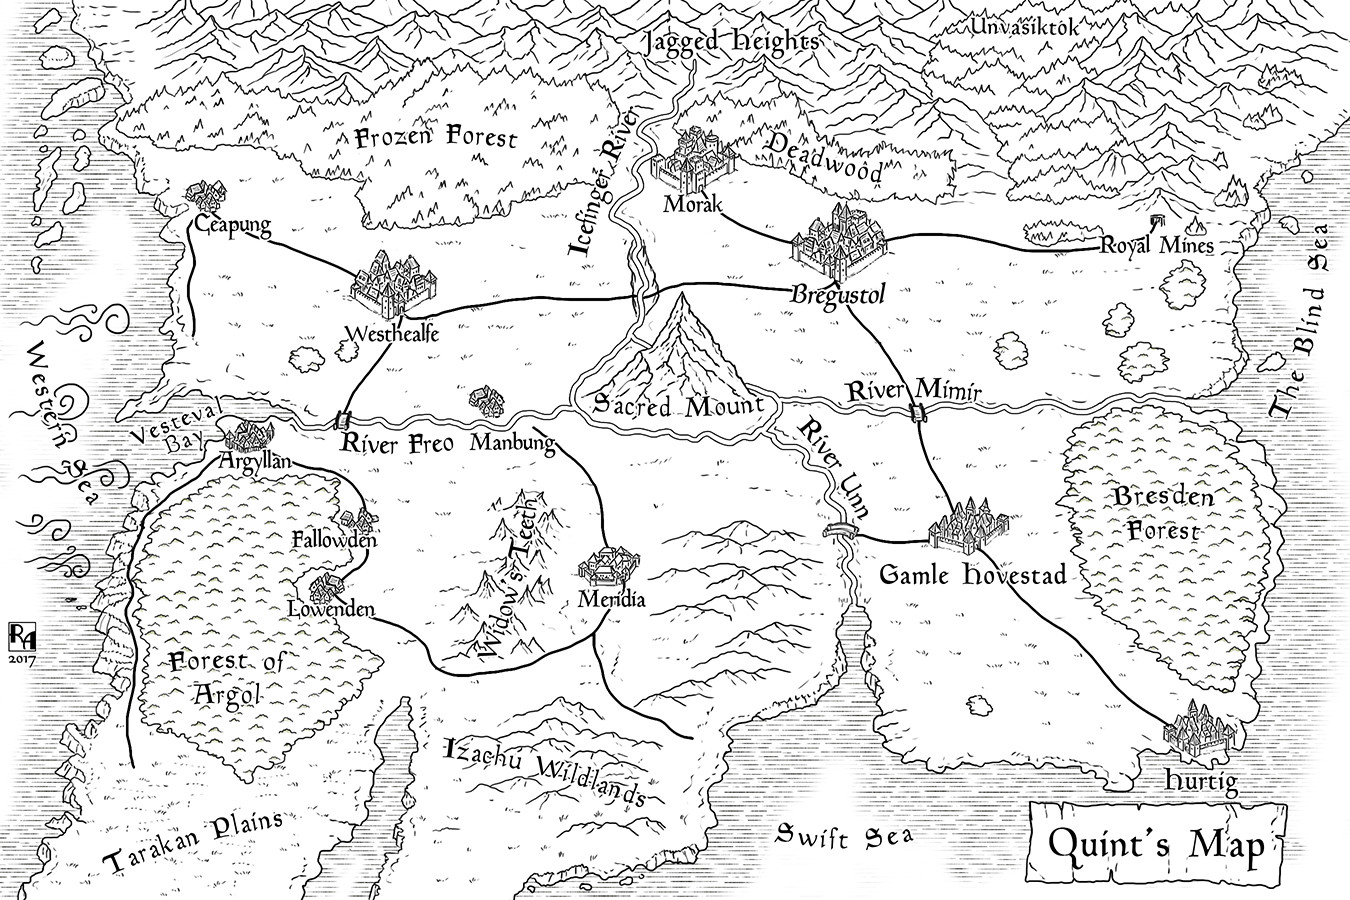 Quint's Map